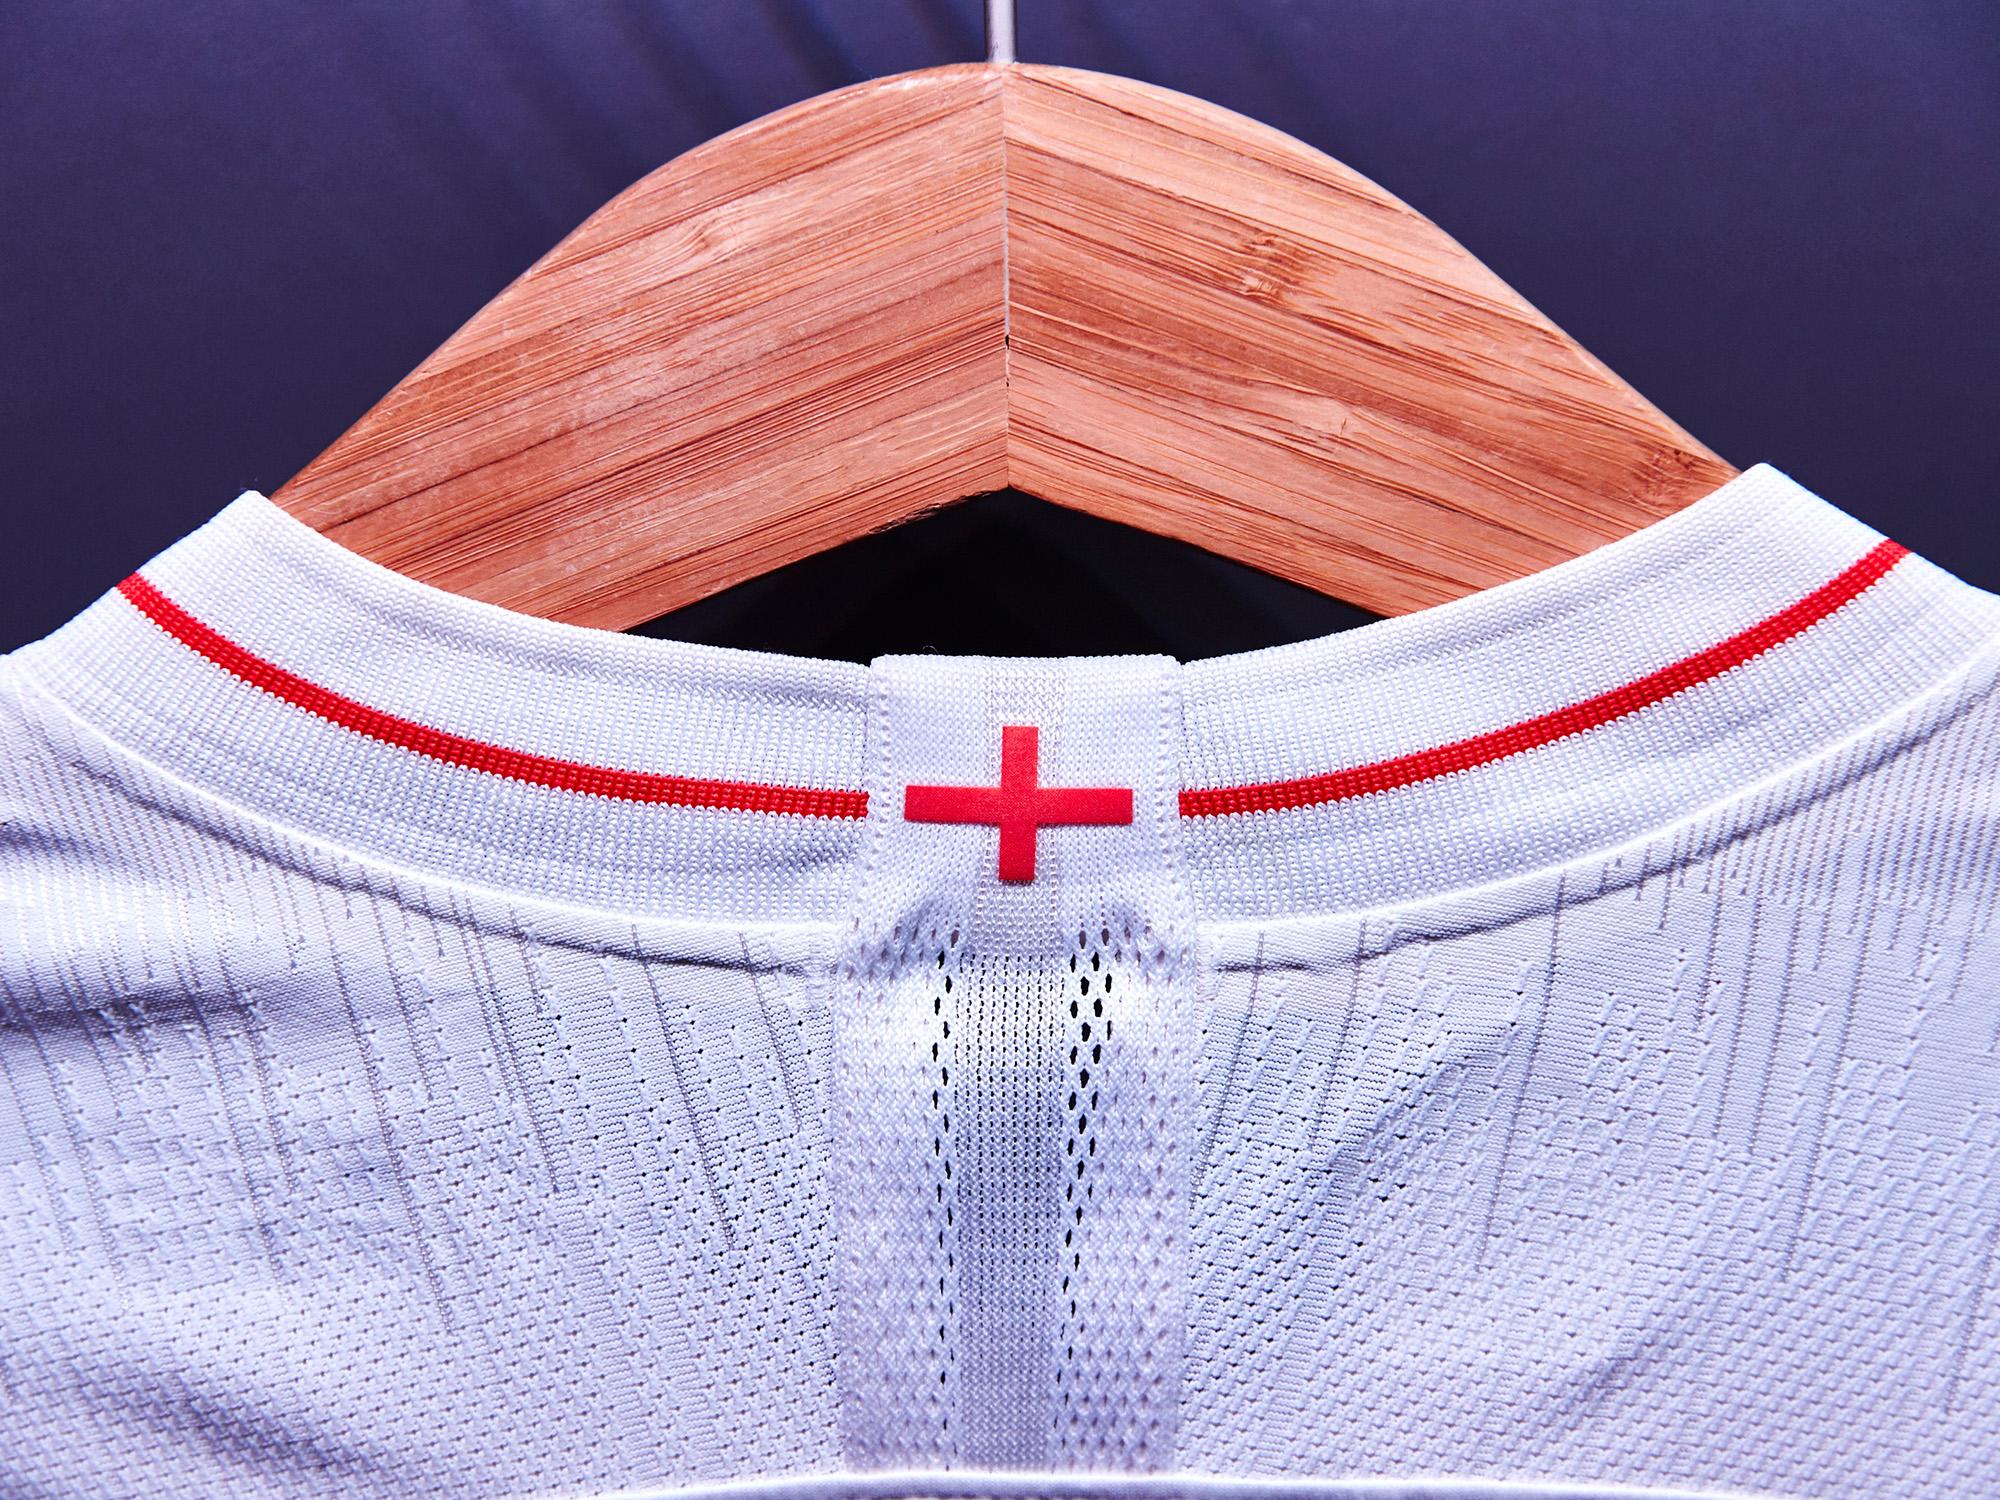 Nike-News-Football-Soccer-England-National-Team-Kit-5_77382